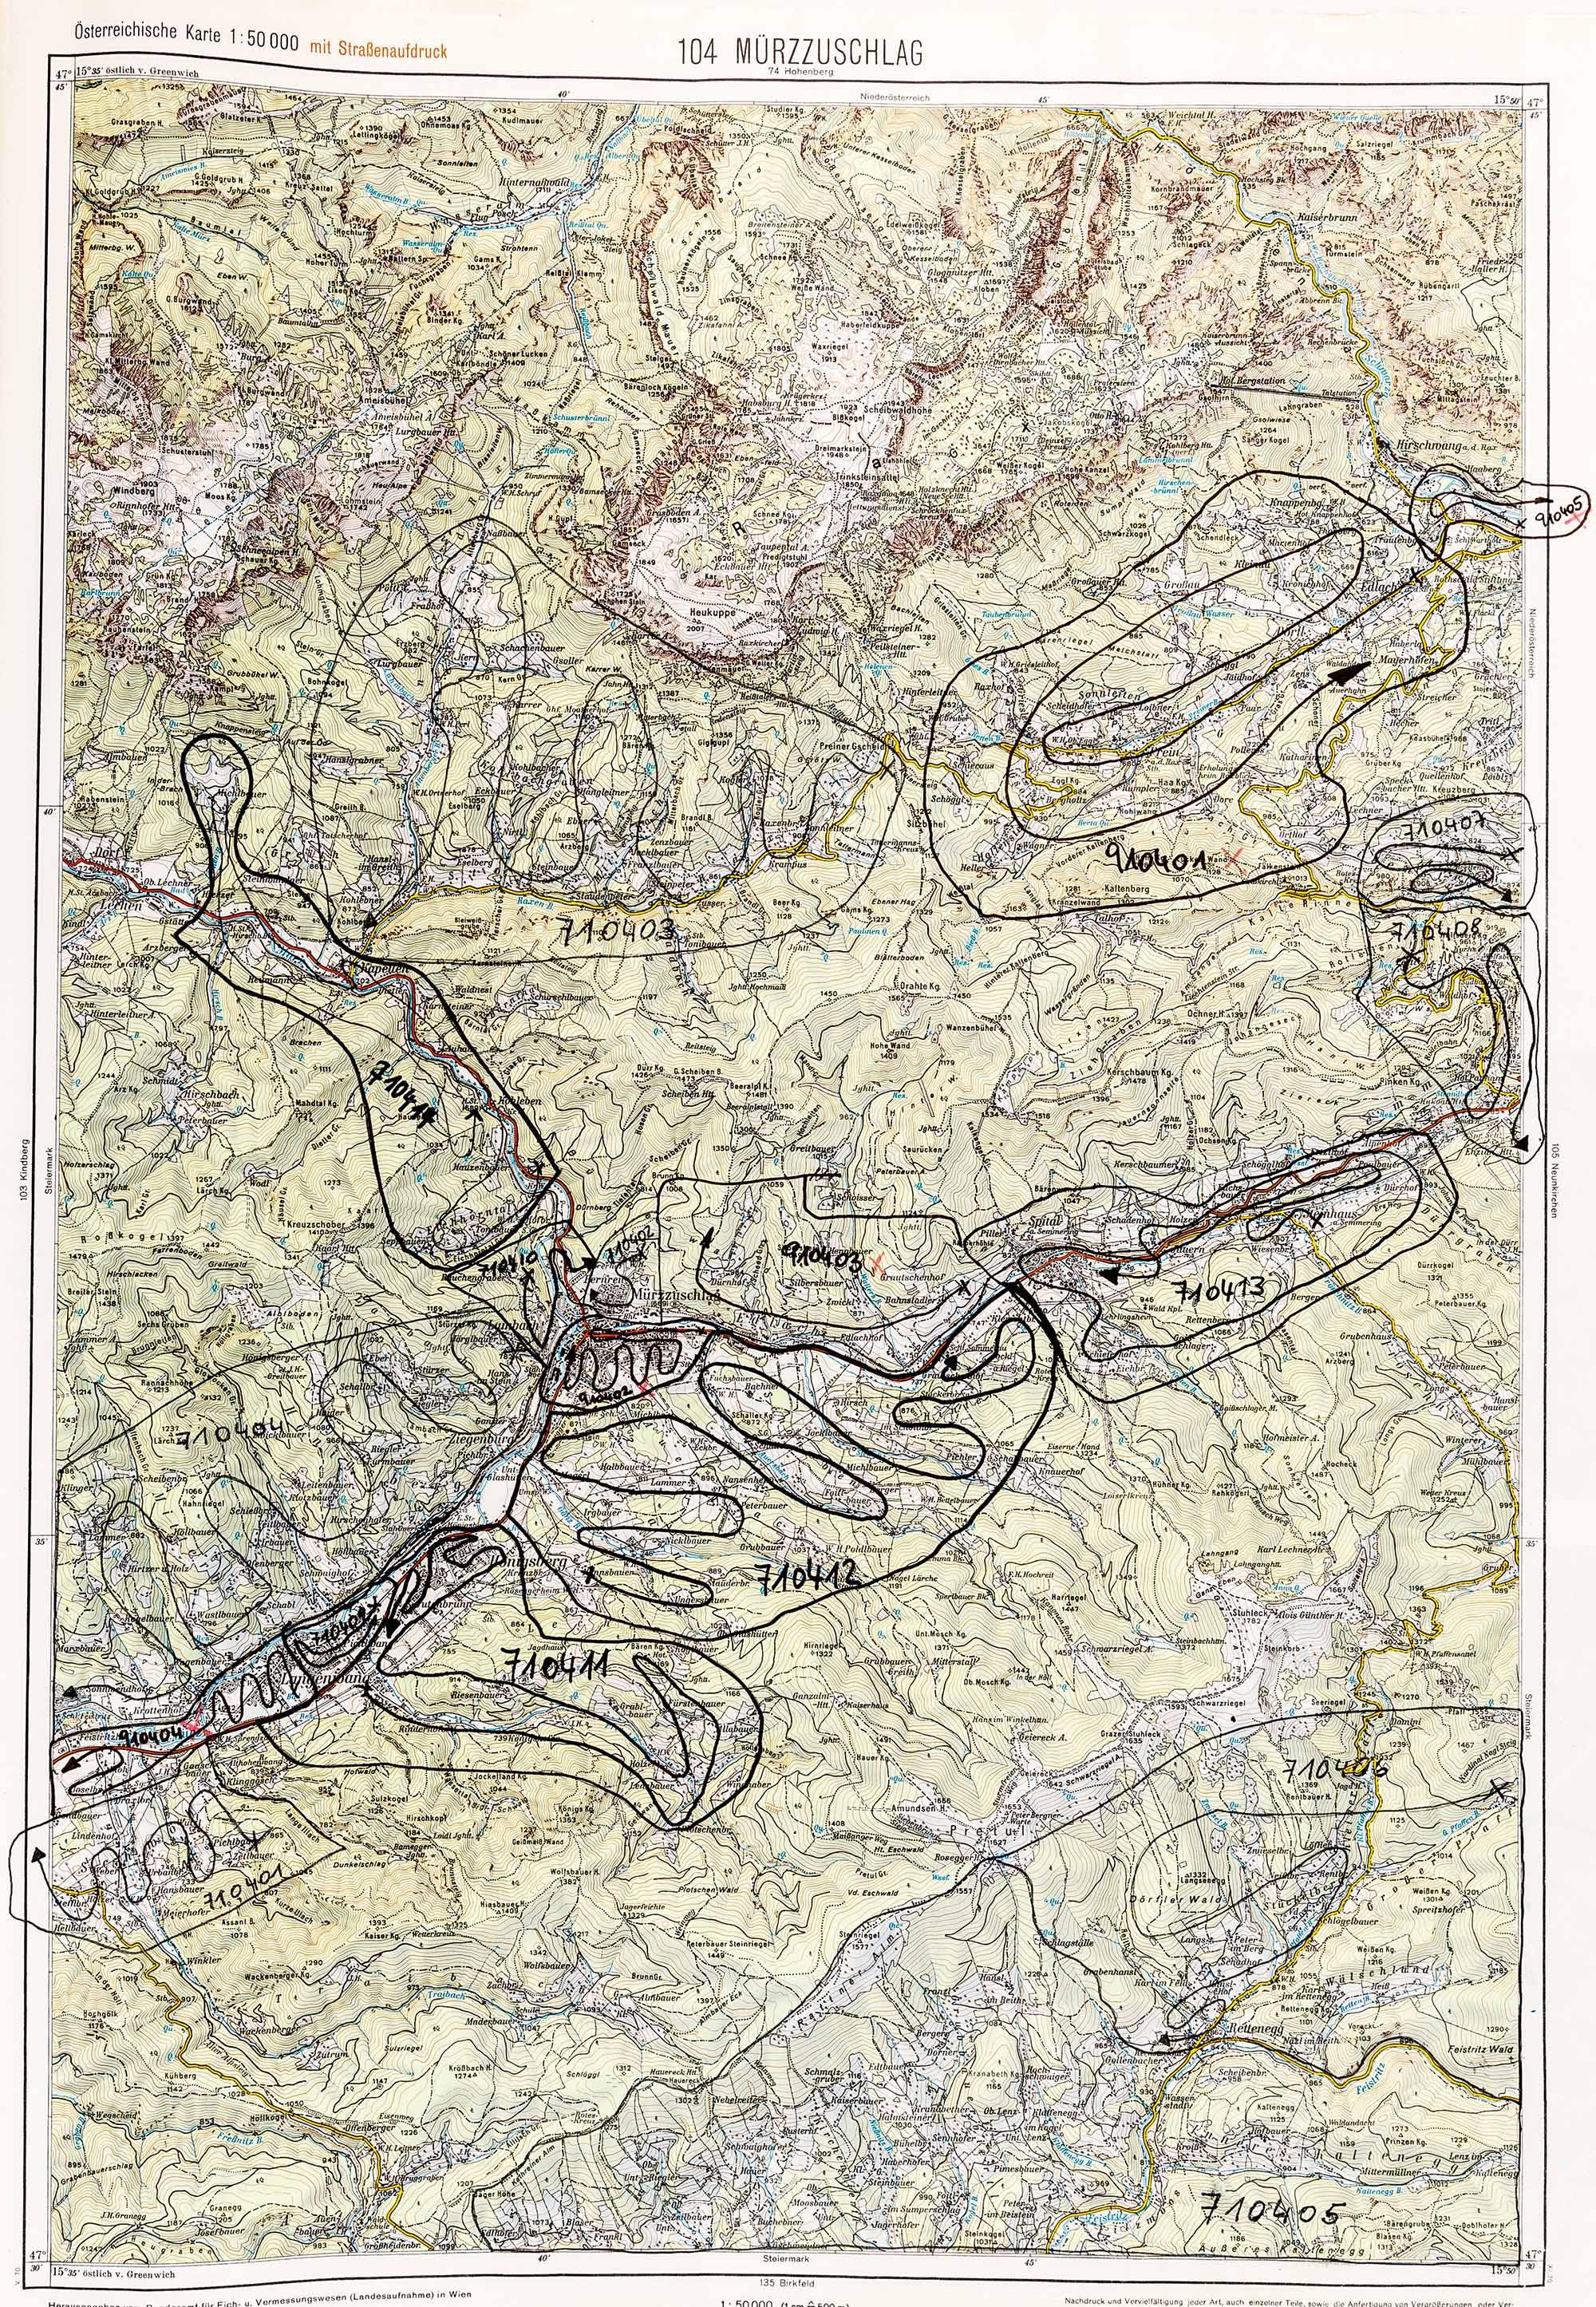 1975-1979 Karte 104